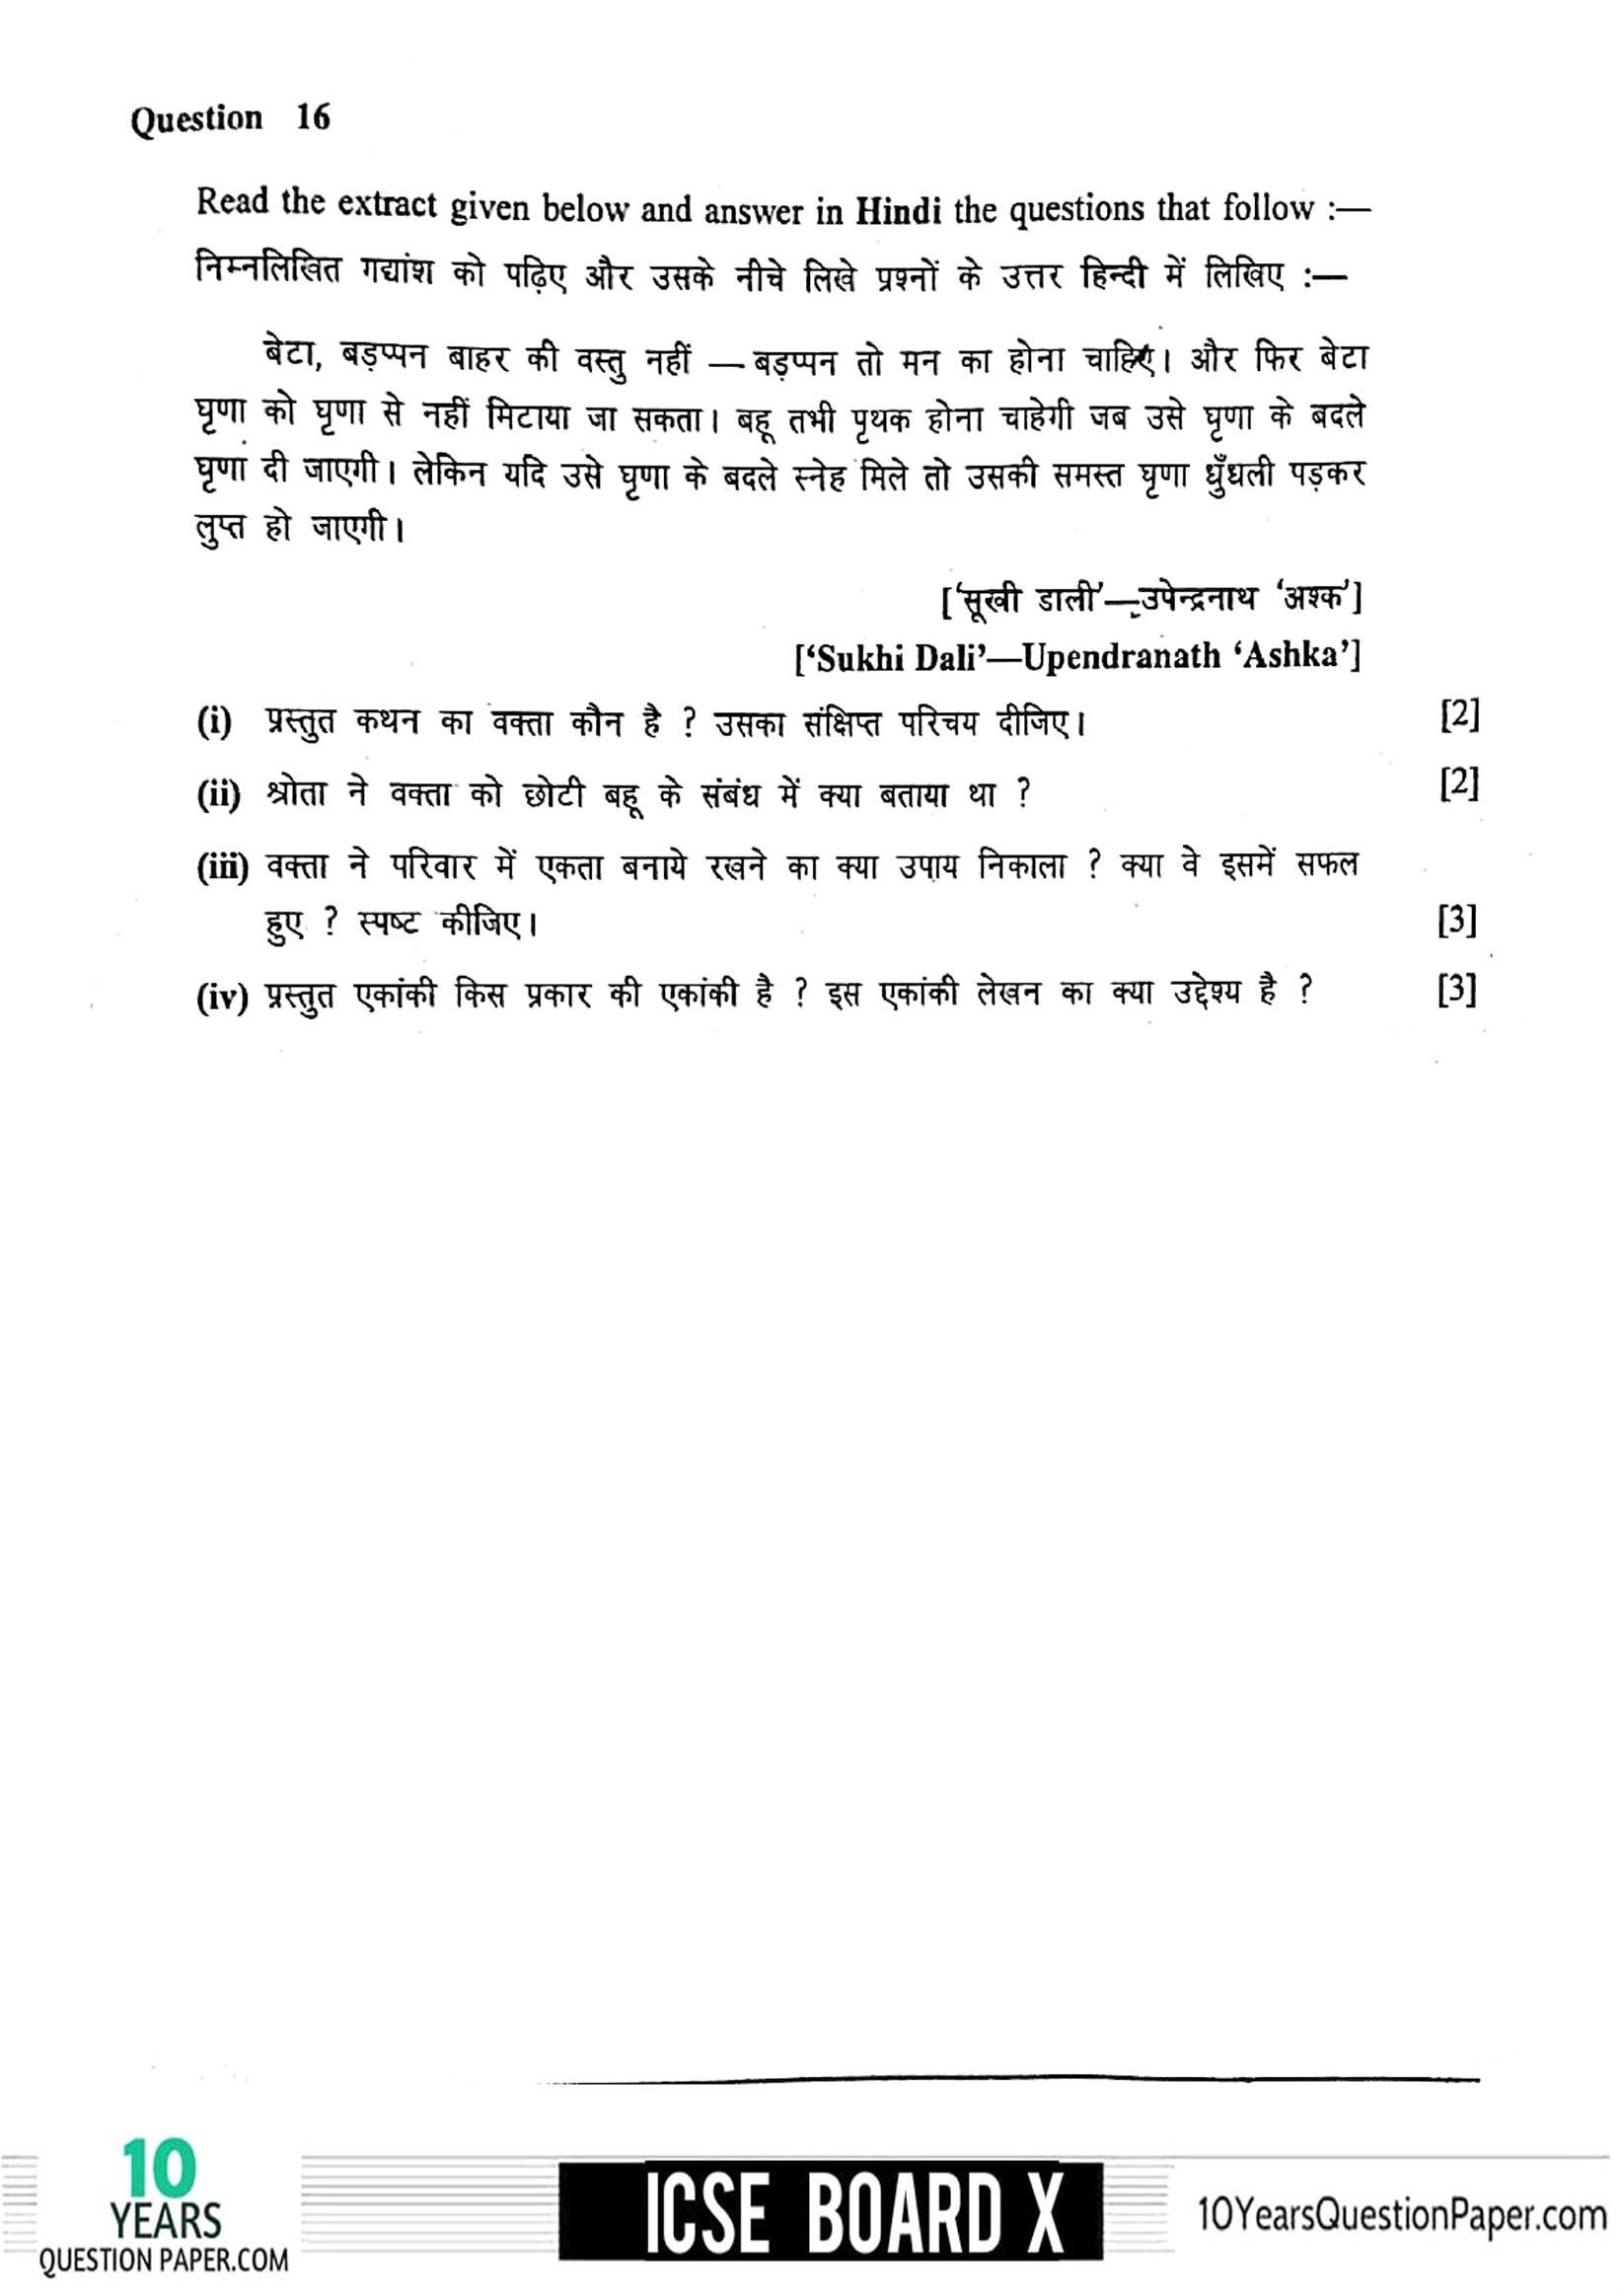 ICSE Class 10 Hindi 2019 Question Paper